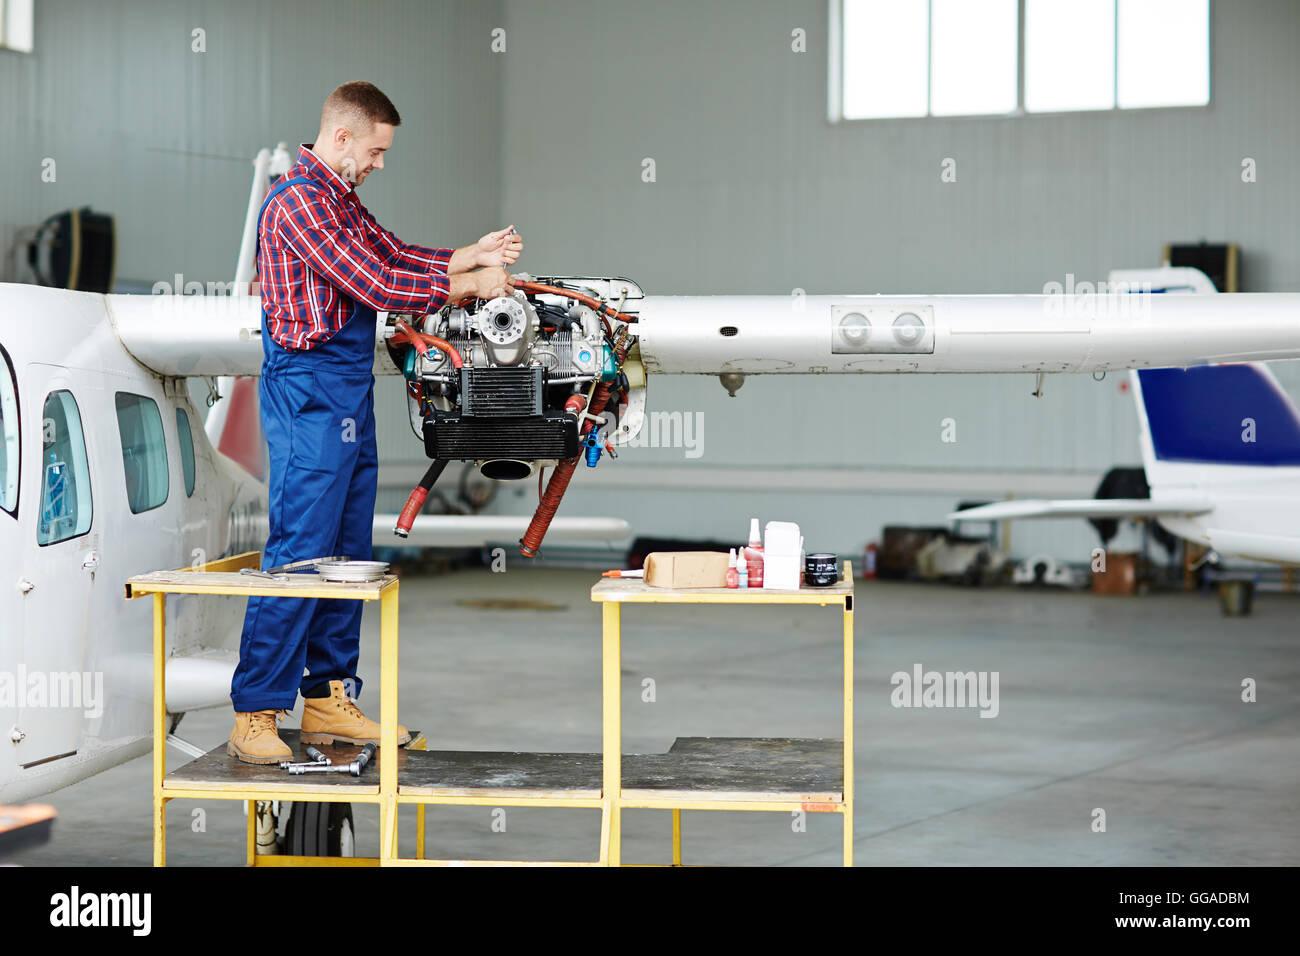 Job of workman - Stock Image